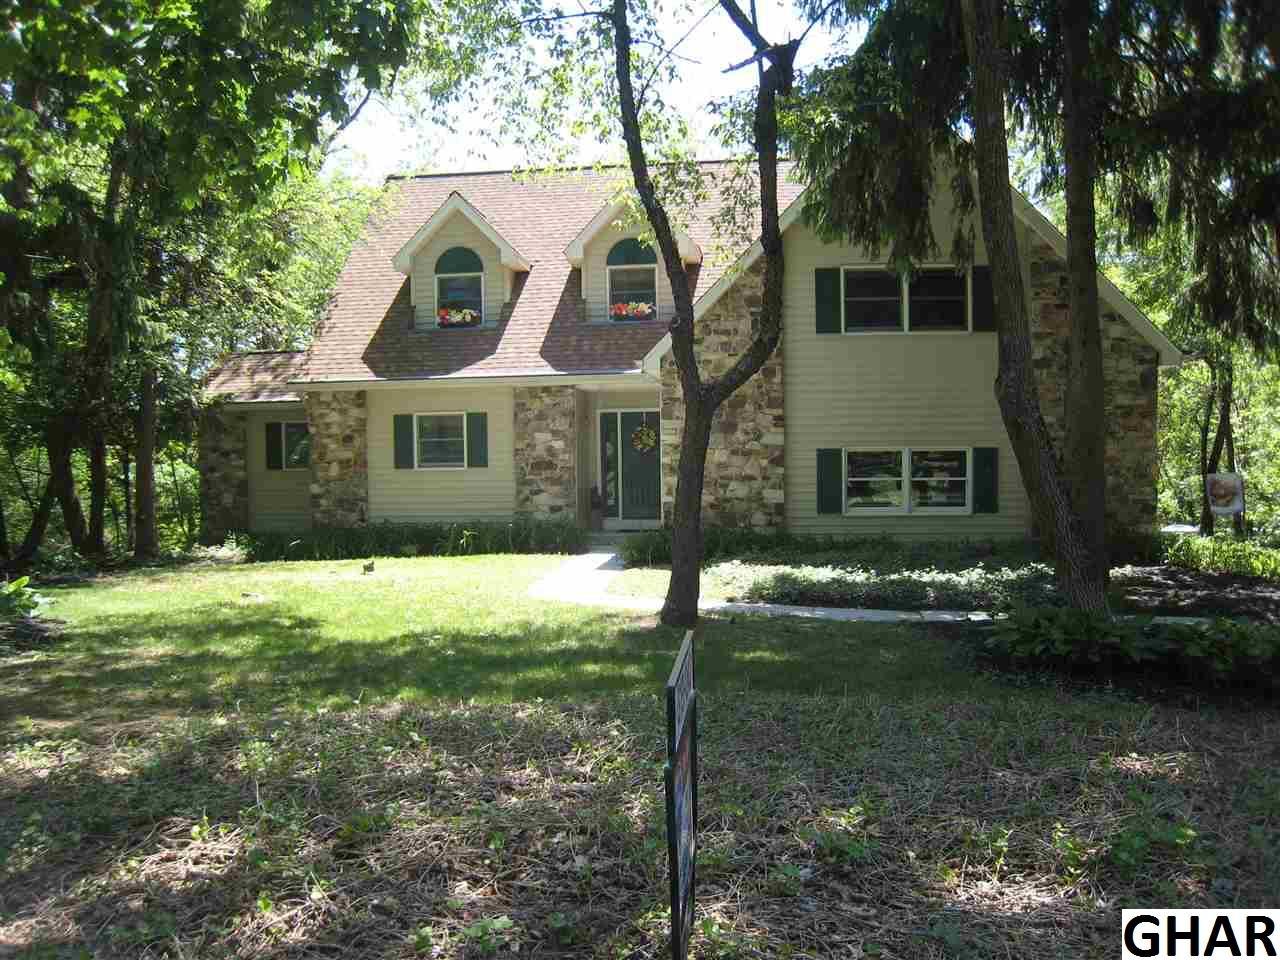 Single Family Home for Sale, ListingId:33034727, location: 1605 Galen Rd Harrisburg 17110